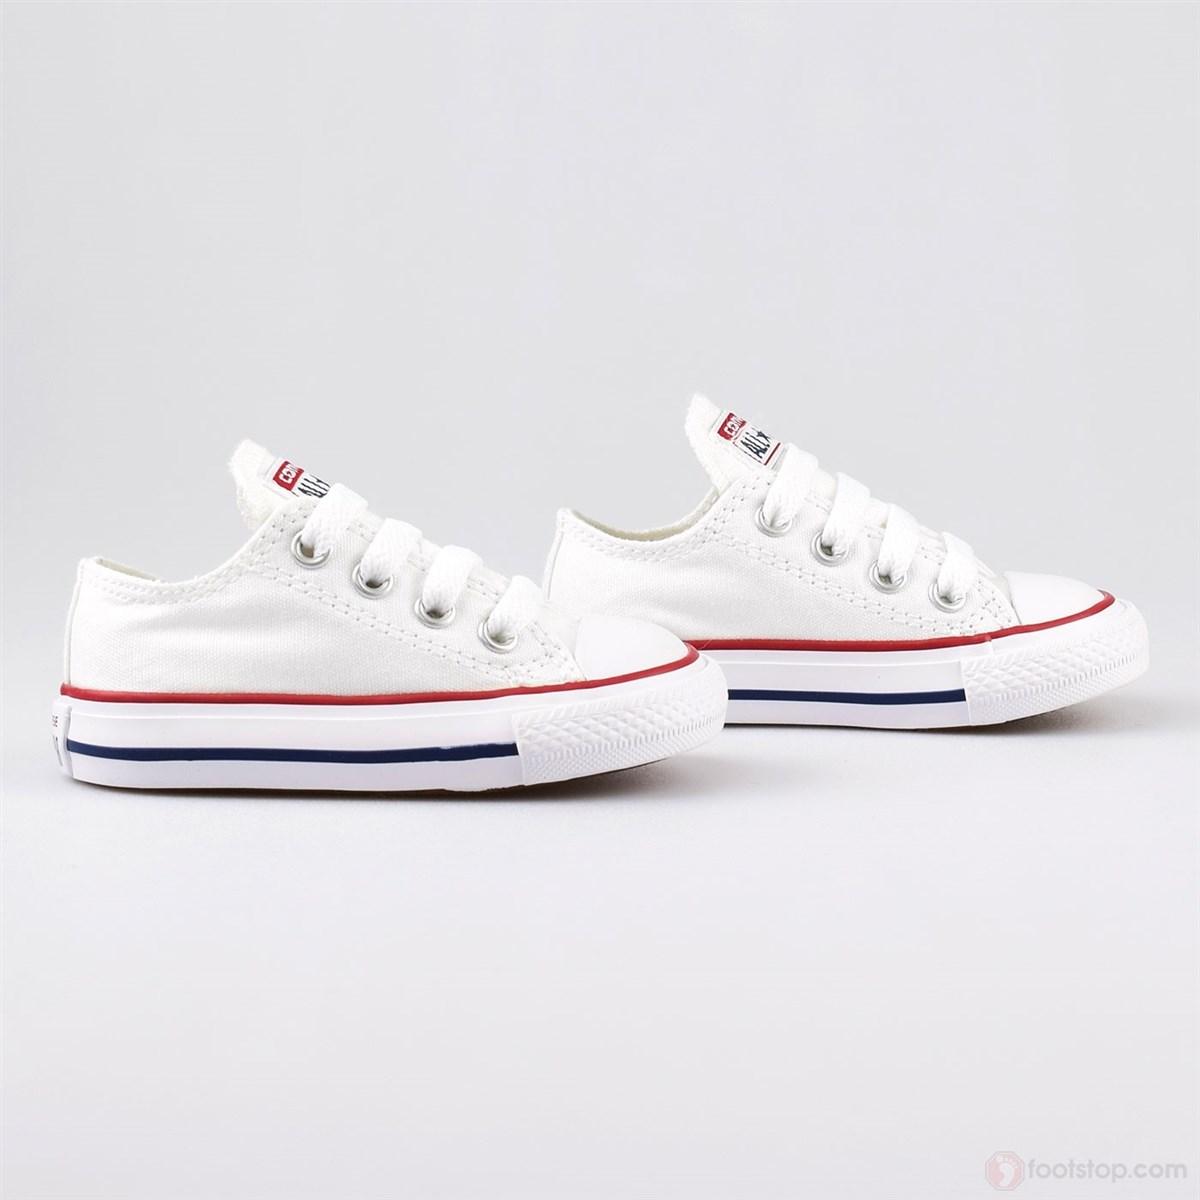 Chuck Taylor All Star Beyaz Spor Ayakkabı